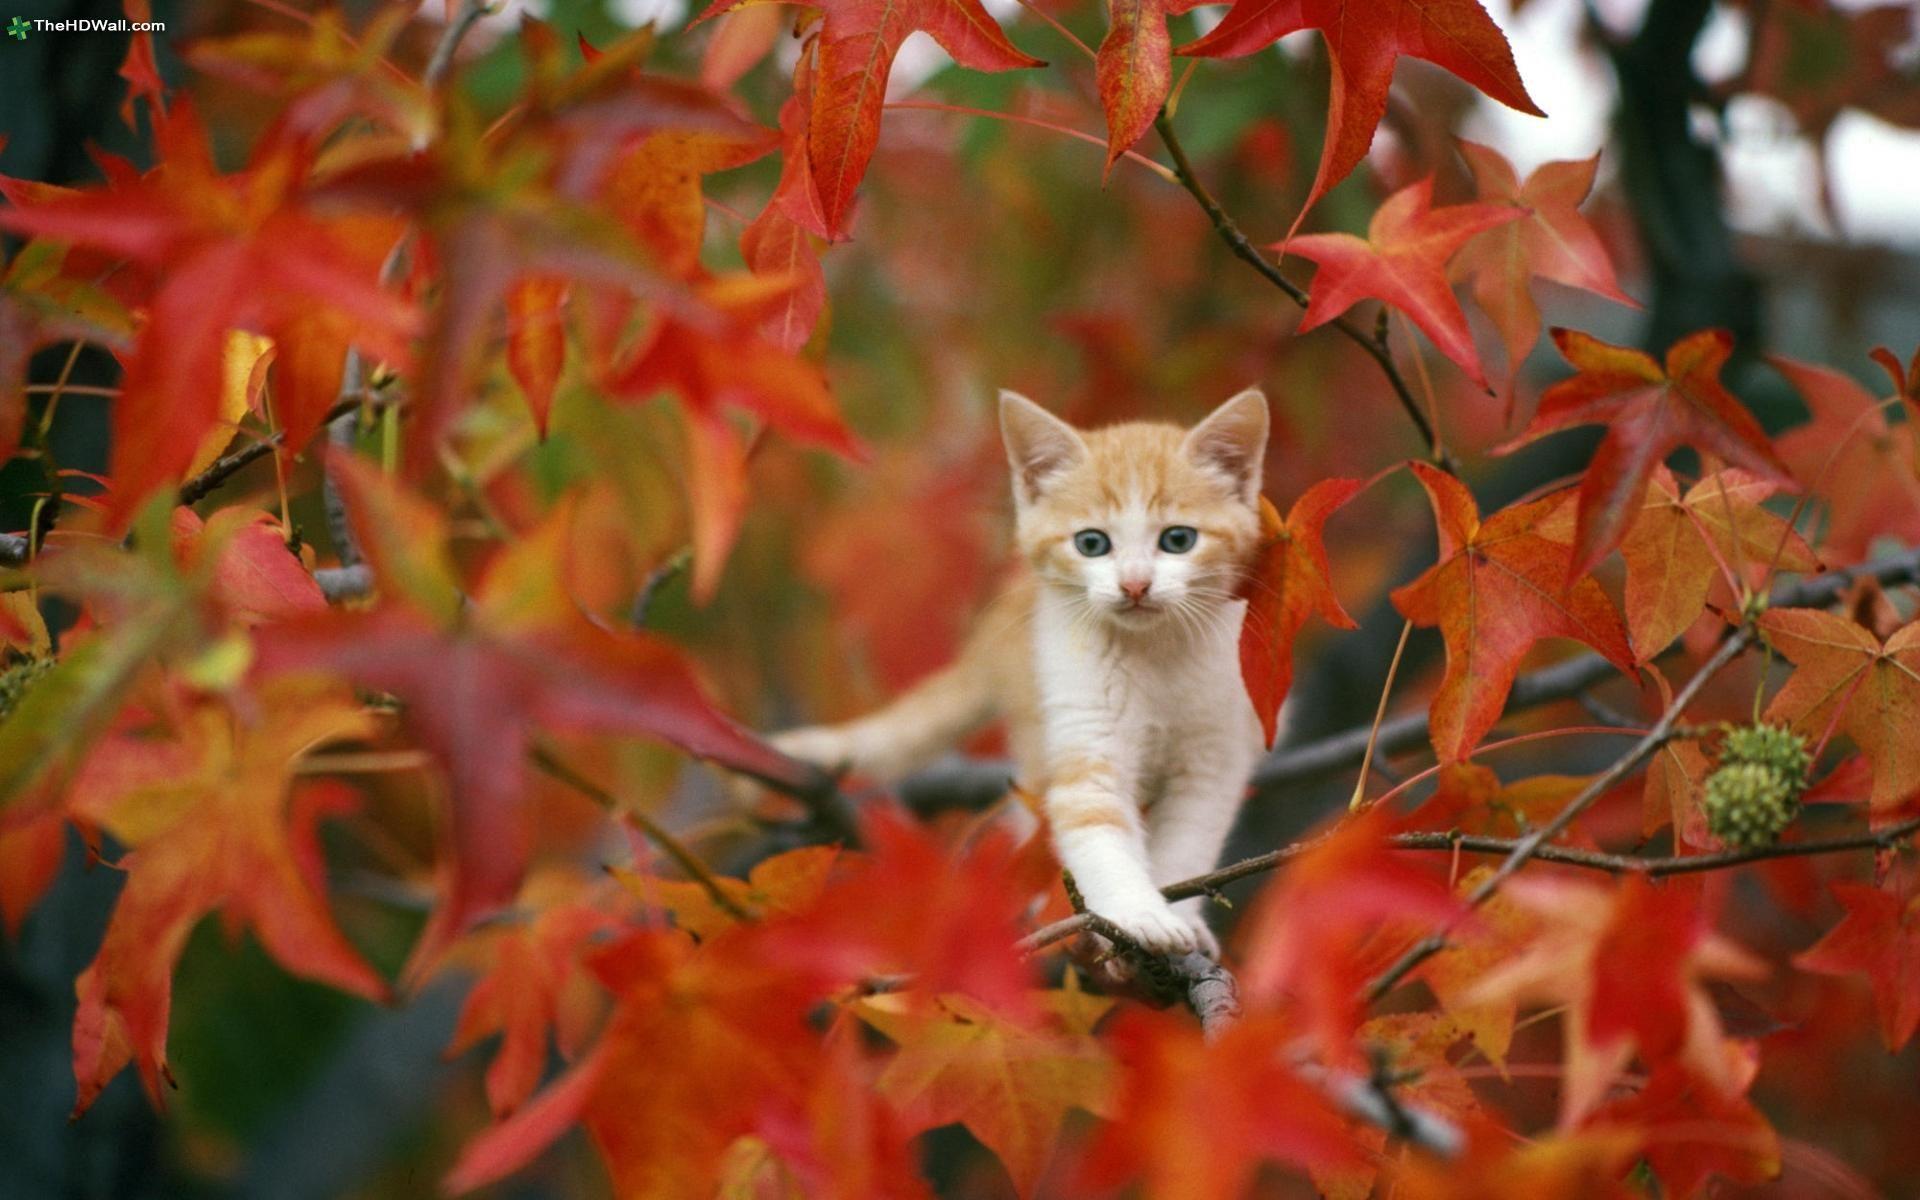 Pets #Fall #Autumn #Leaves #Cats #Kitten #FallFoliage #Puppies #FallColors # Cute #Adorable #Animals | Pretty cats, Cats and kittens, Cute animals